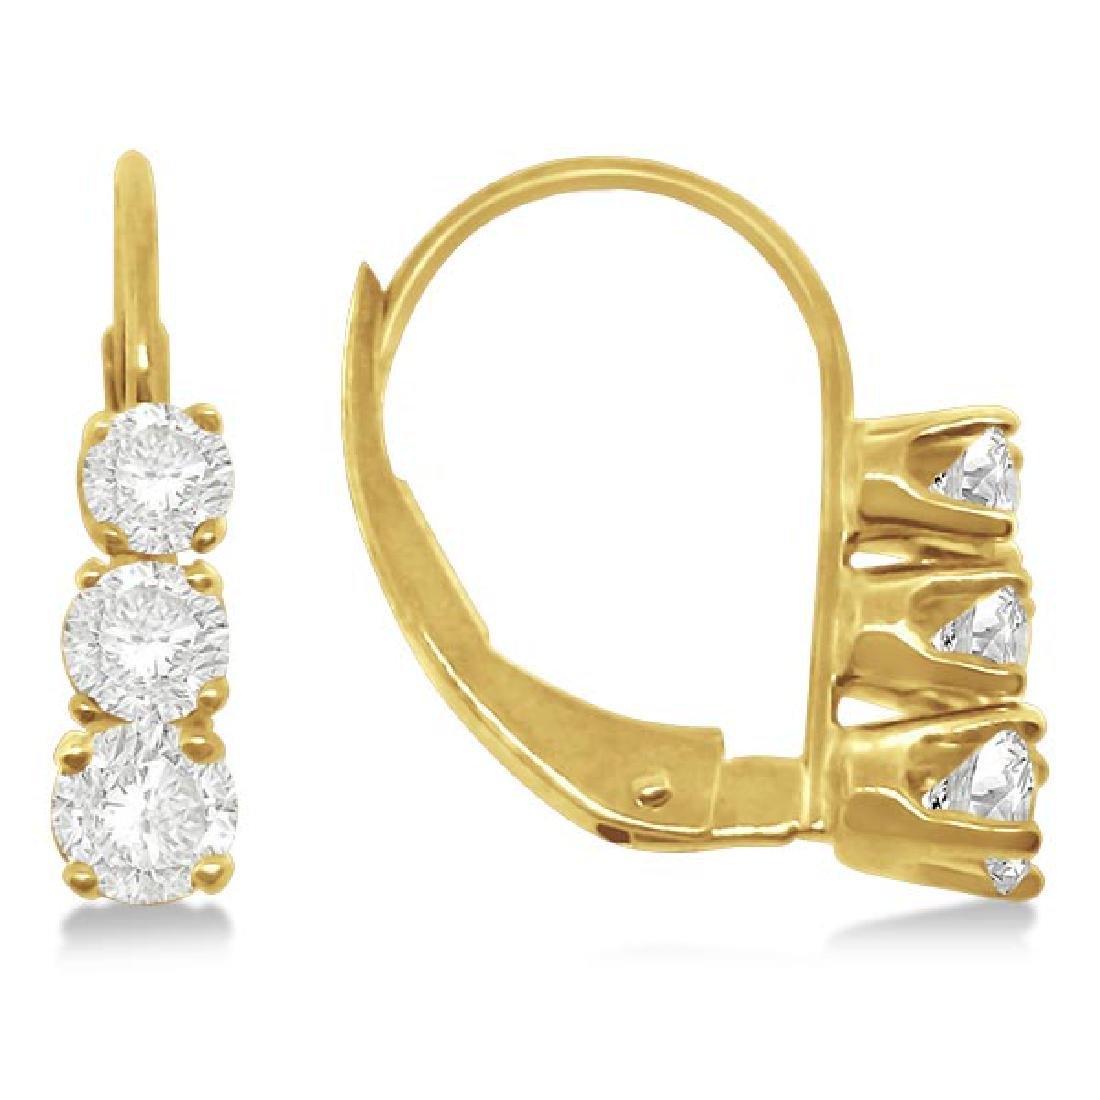 Three-Stone Leverback Diamond Earrings 14k Yellow Gold